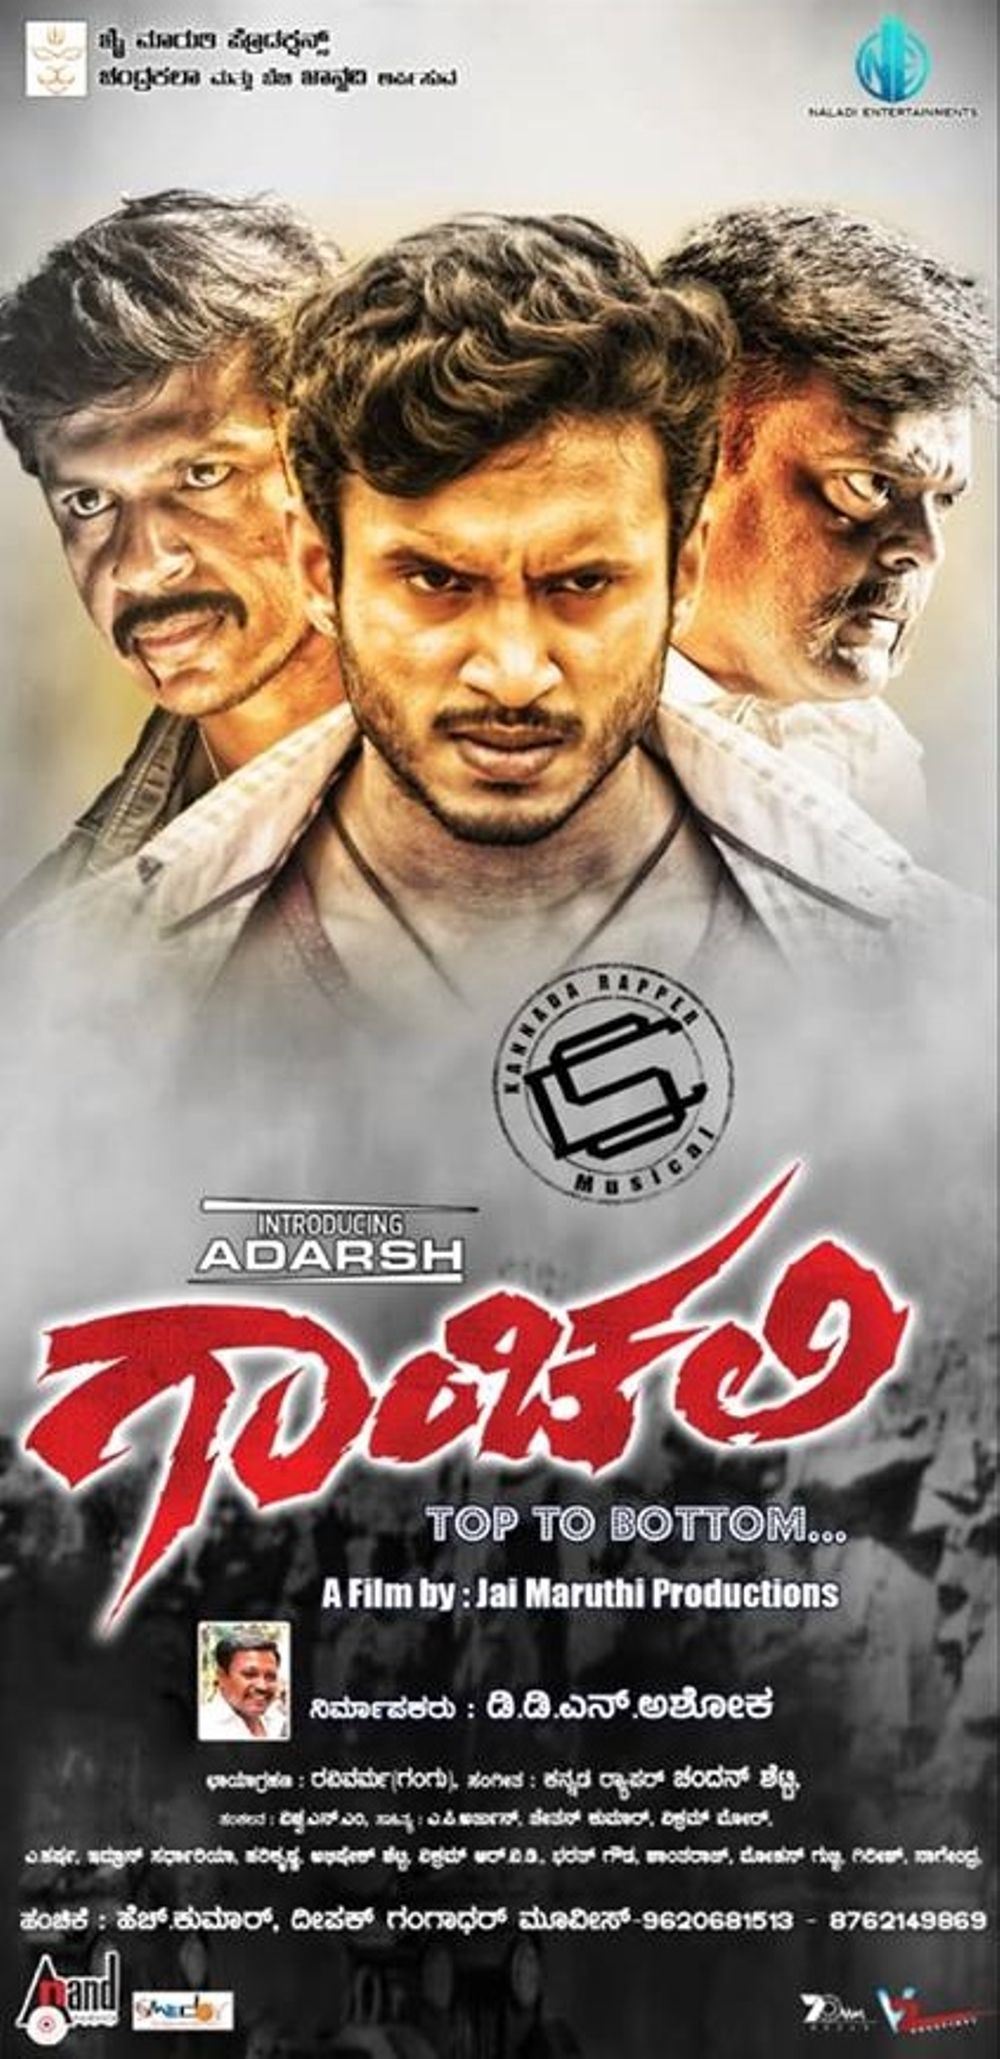 Gaanchali Movi Review Kannada Movie Review